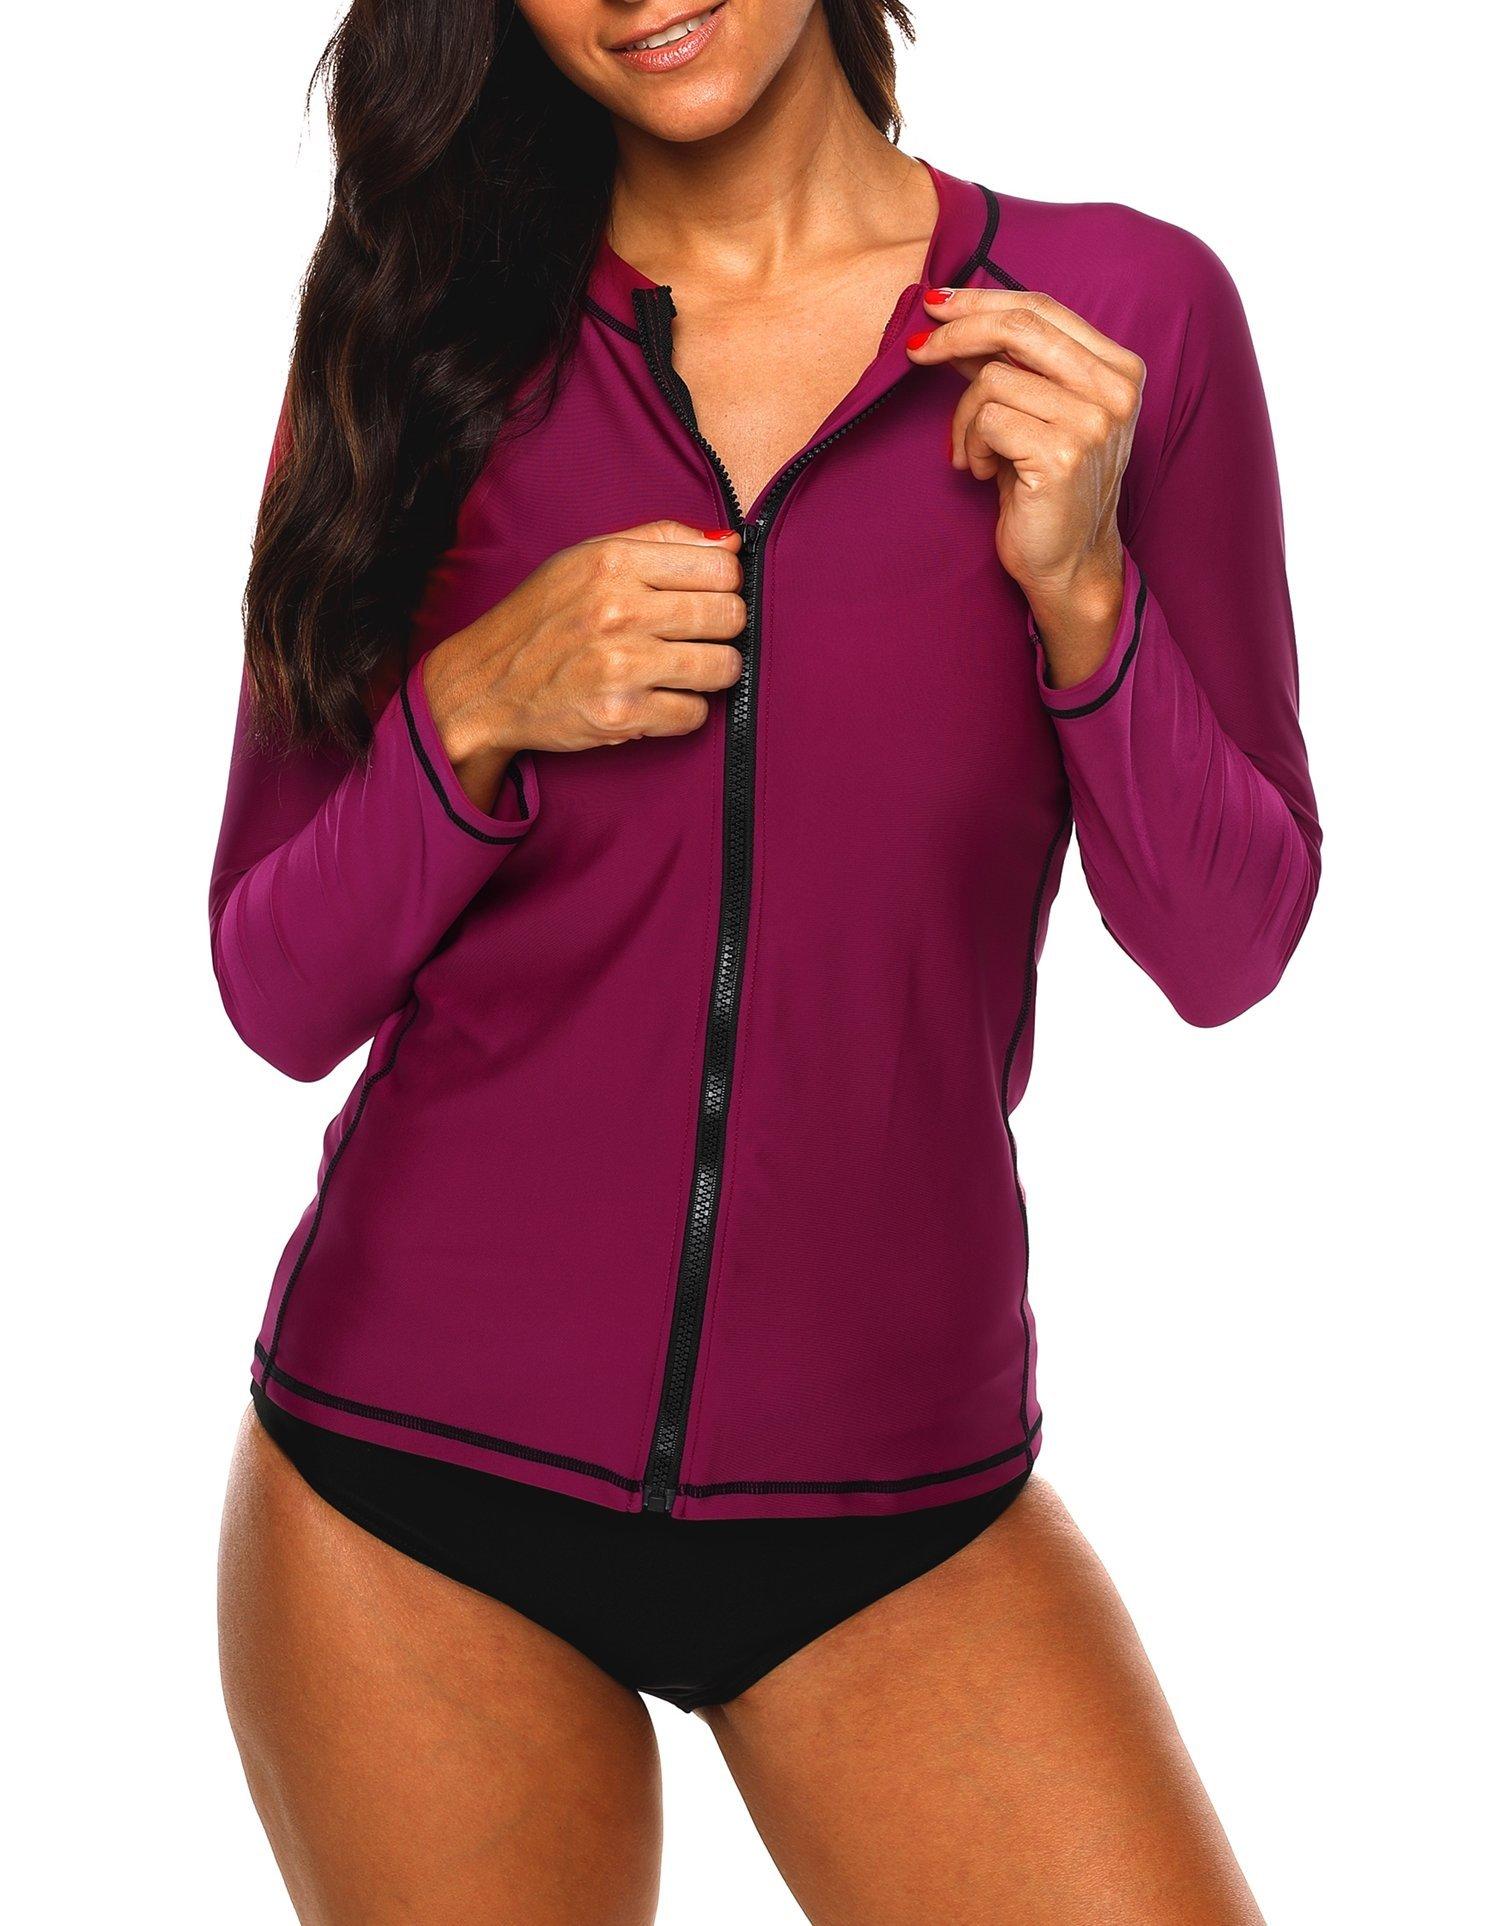 ATTRACO Womens Rash Guard Top Zip Long Sleeve Solid Swim Shirt Purple Medium by ATTRACO